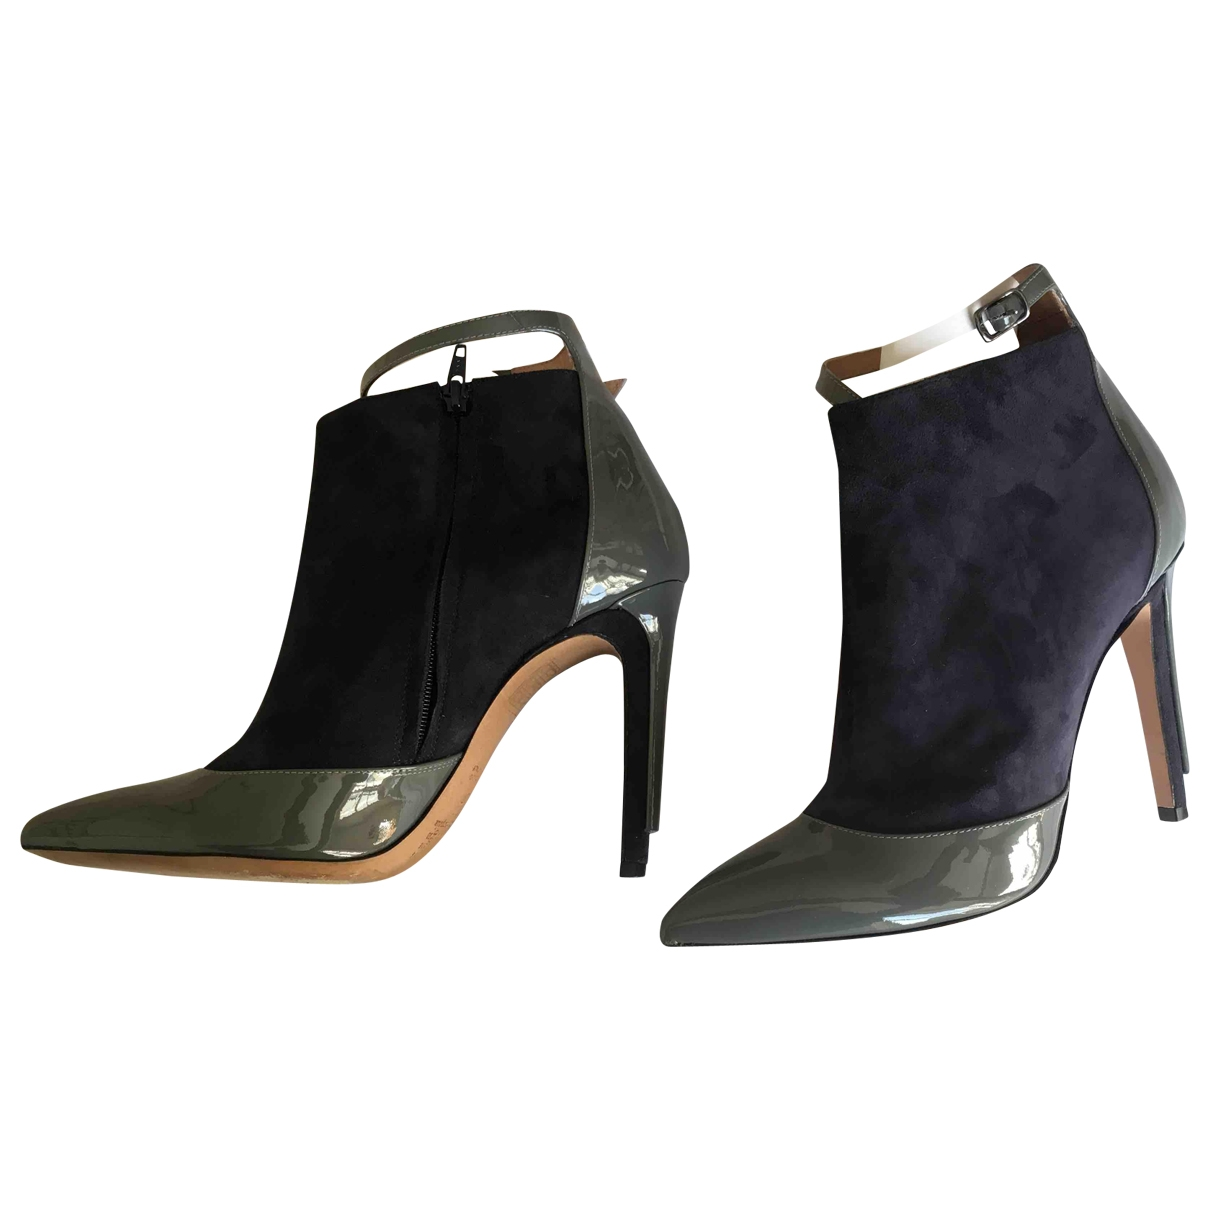 Maison Martin Margiela \N Blue Leather Ankle boots for Women 4 UK